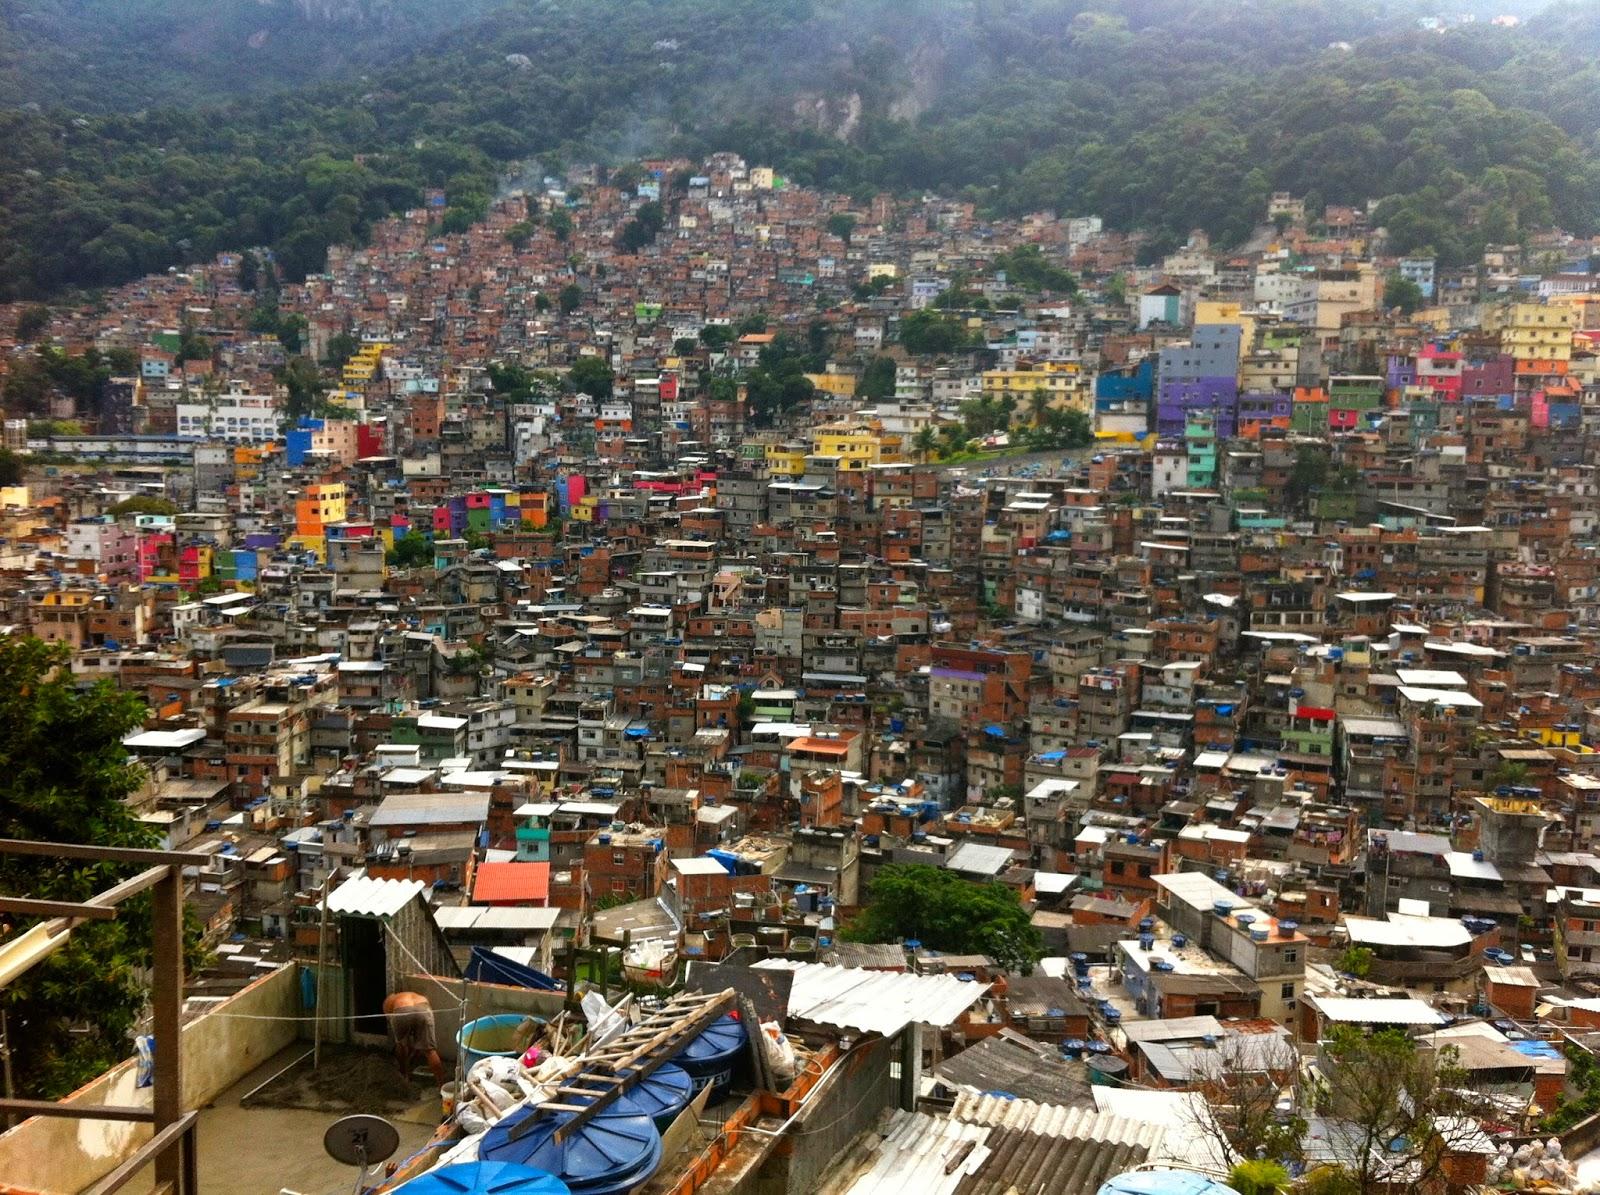 Wanderlust Chloe - Chloe Gunning - Rocinha Favela Rio De Janeiro